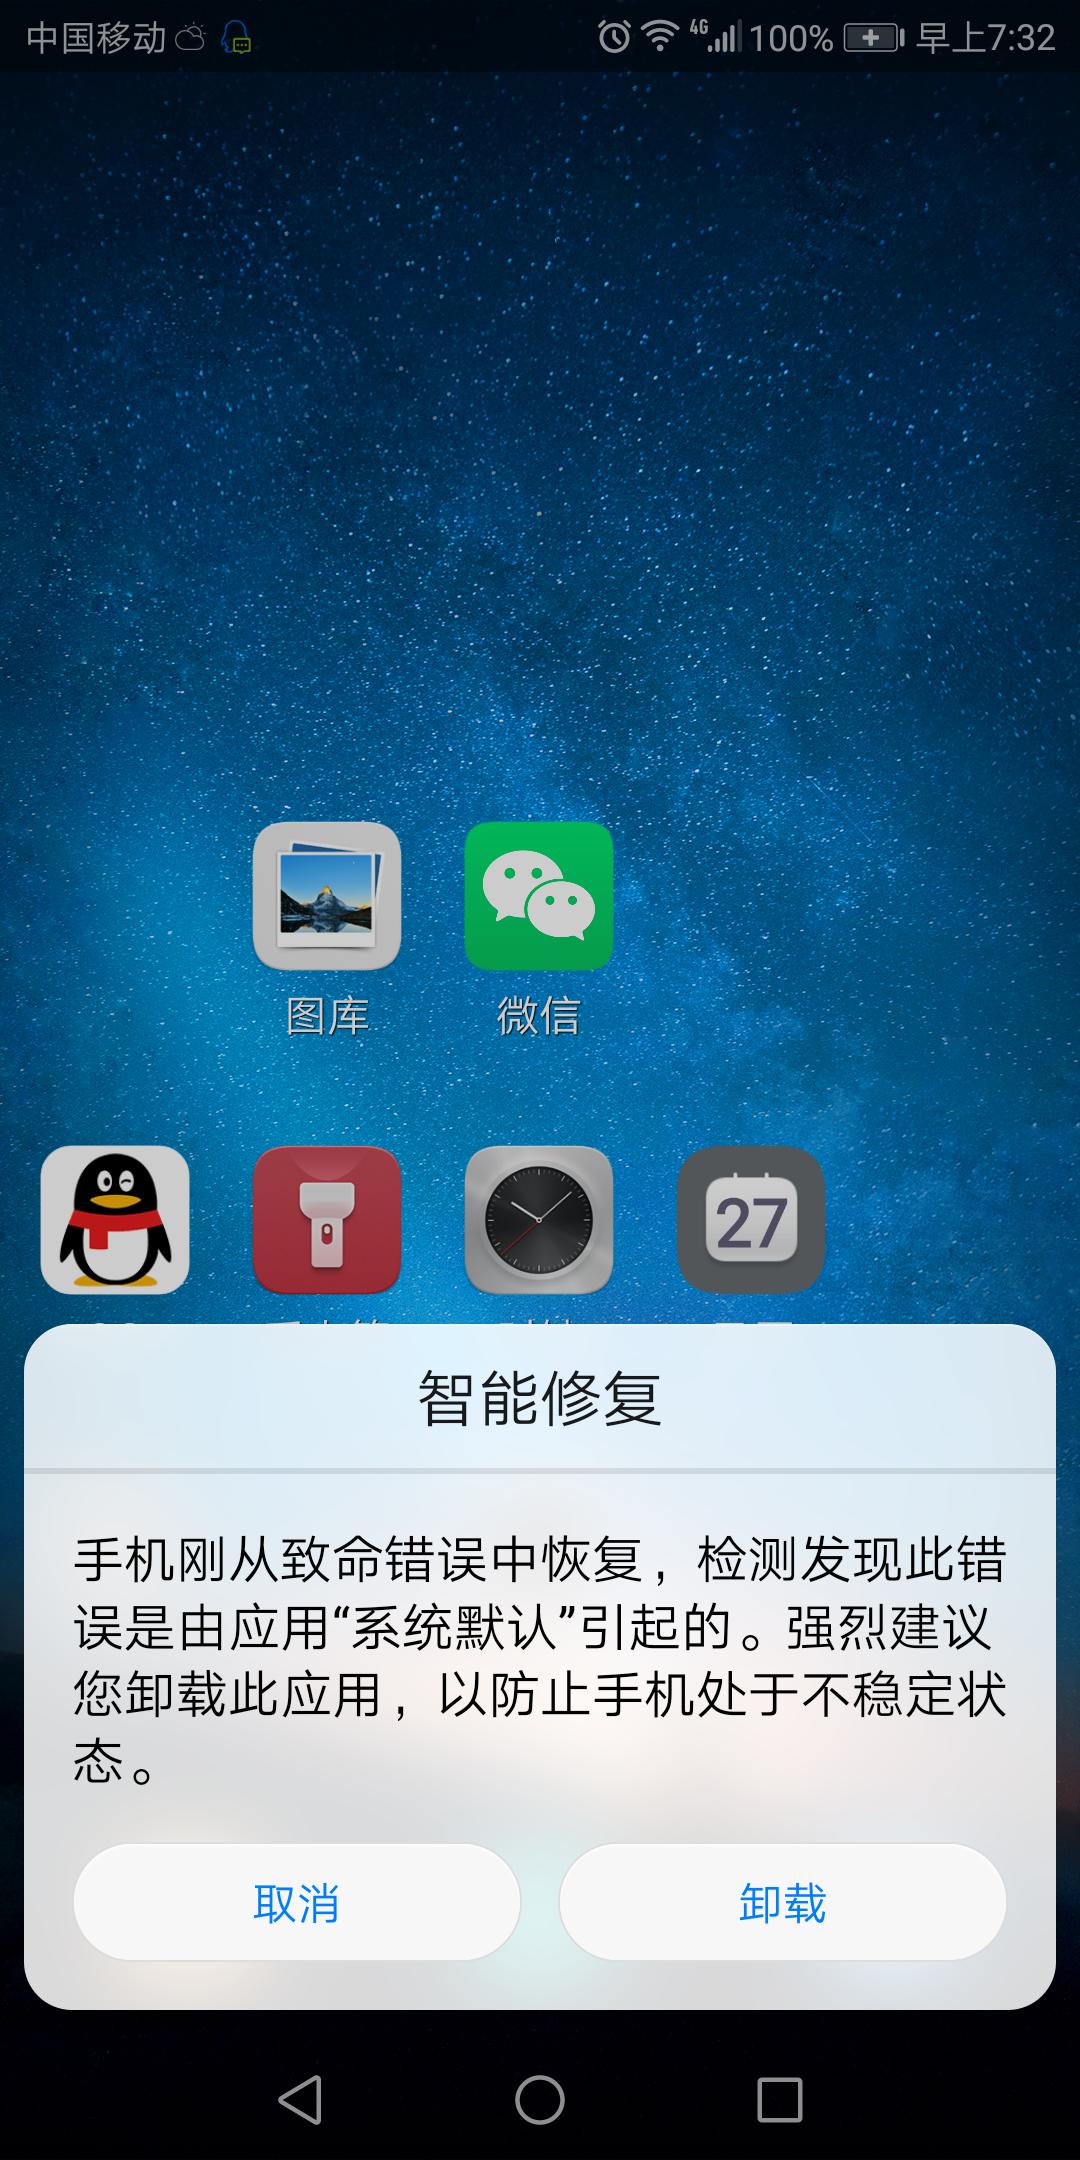 Screenshot_20190227-073212.png